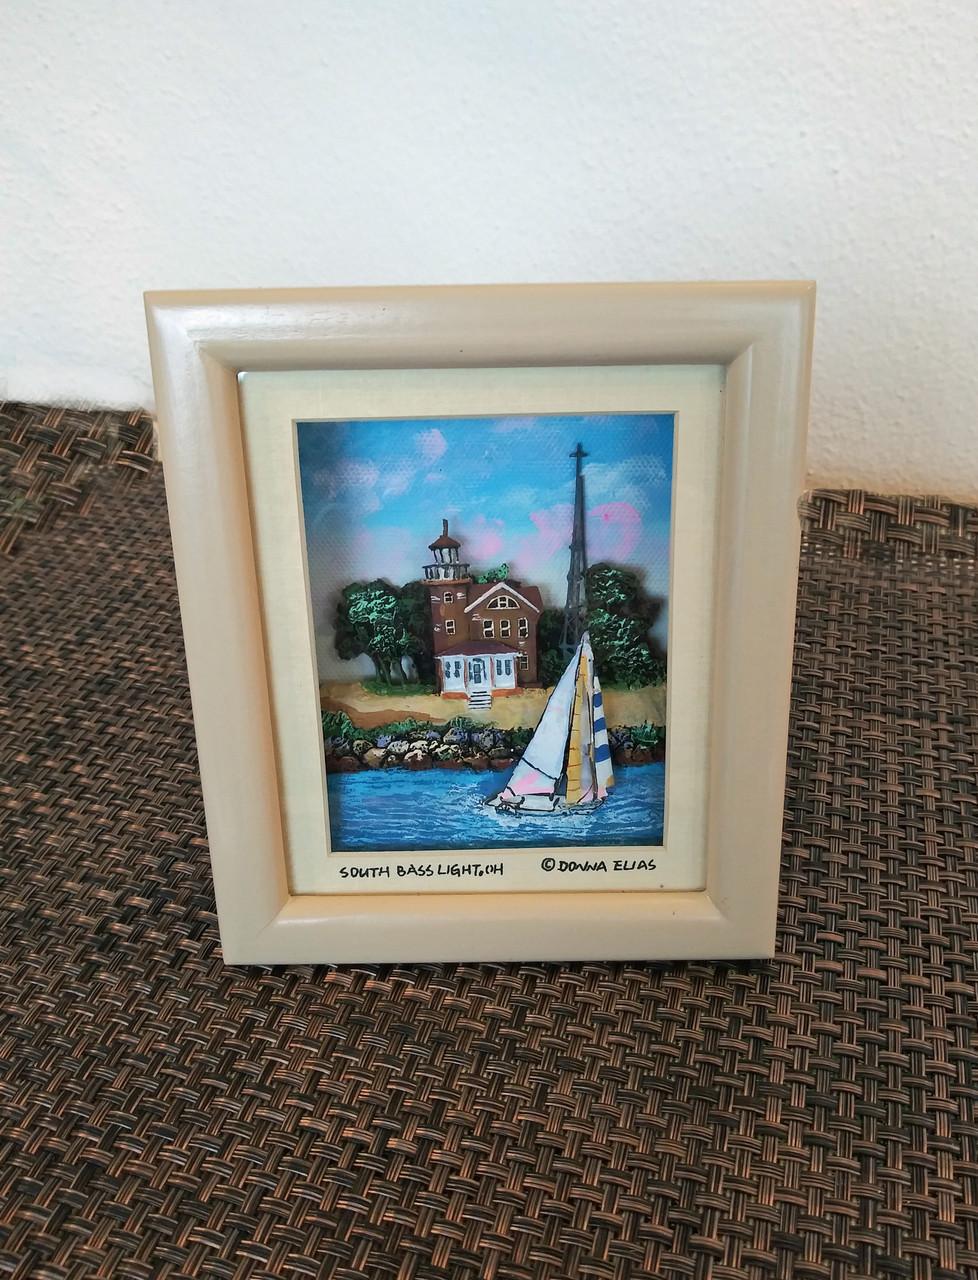 South Bass Lighthouse copyright Donna Elias